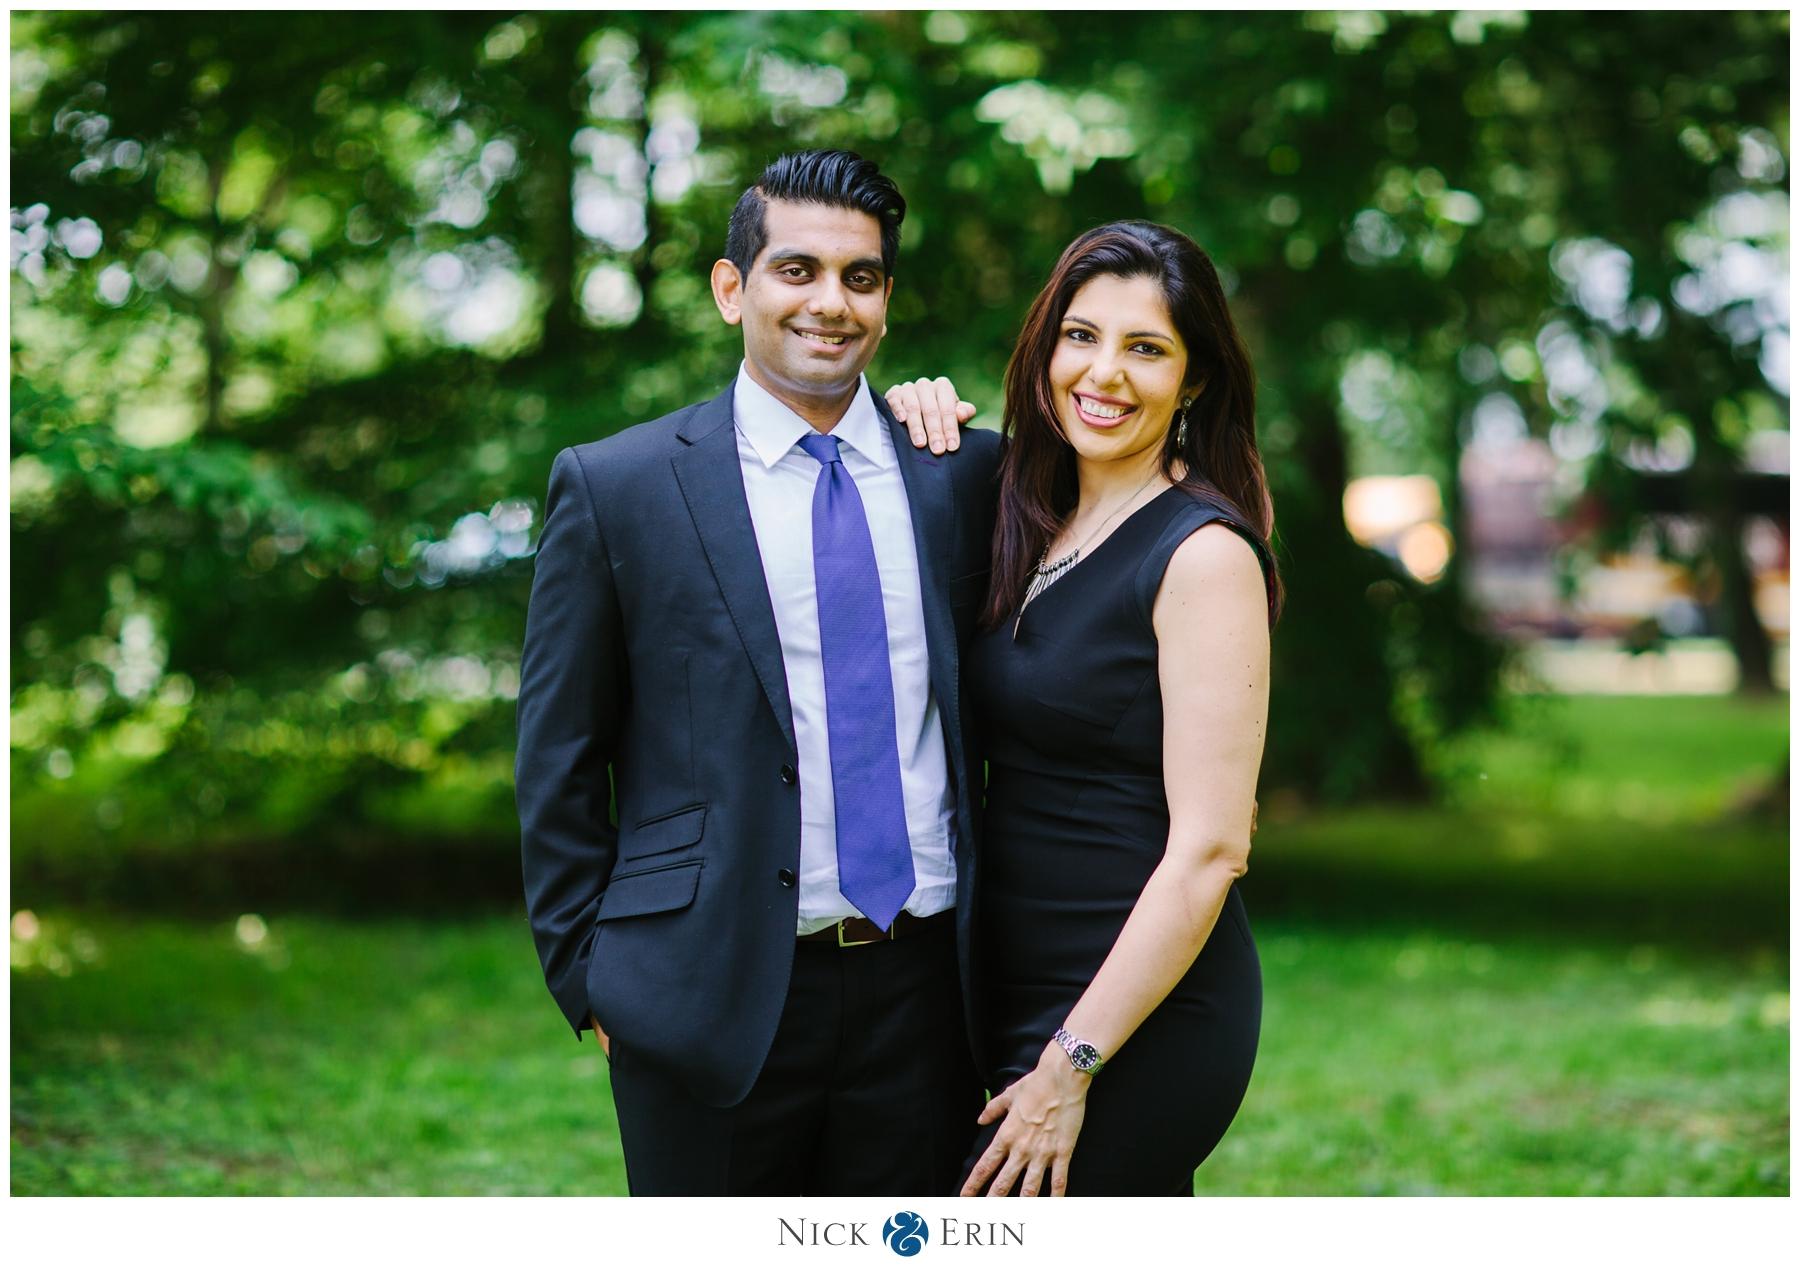 Donner_Photography_Washington DC Engagement_Bharti & Anadi_0001